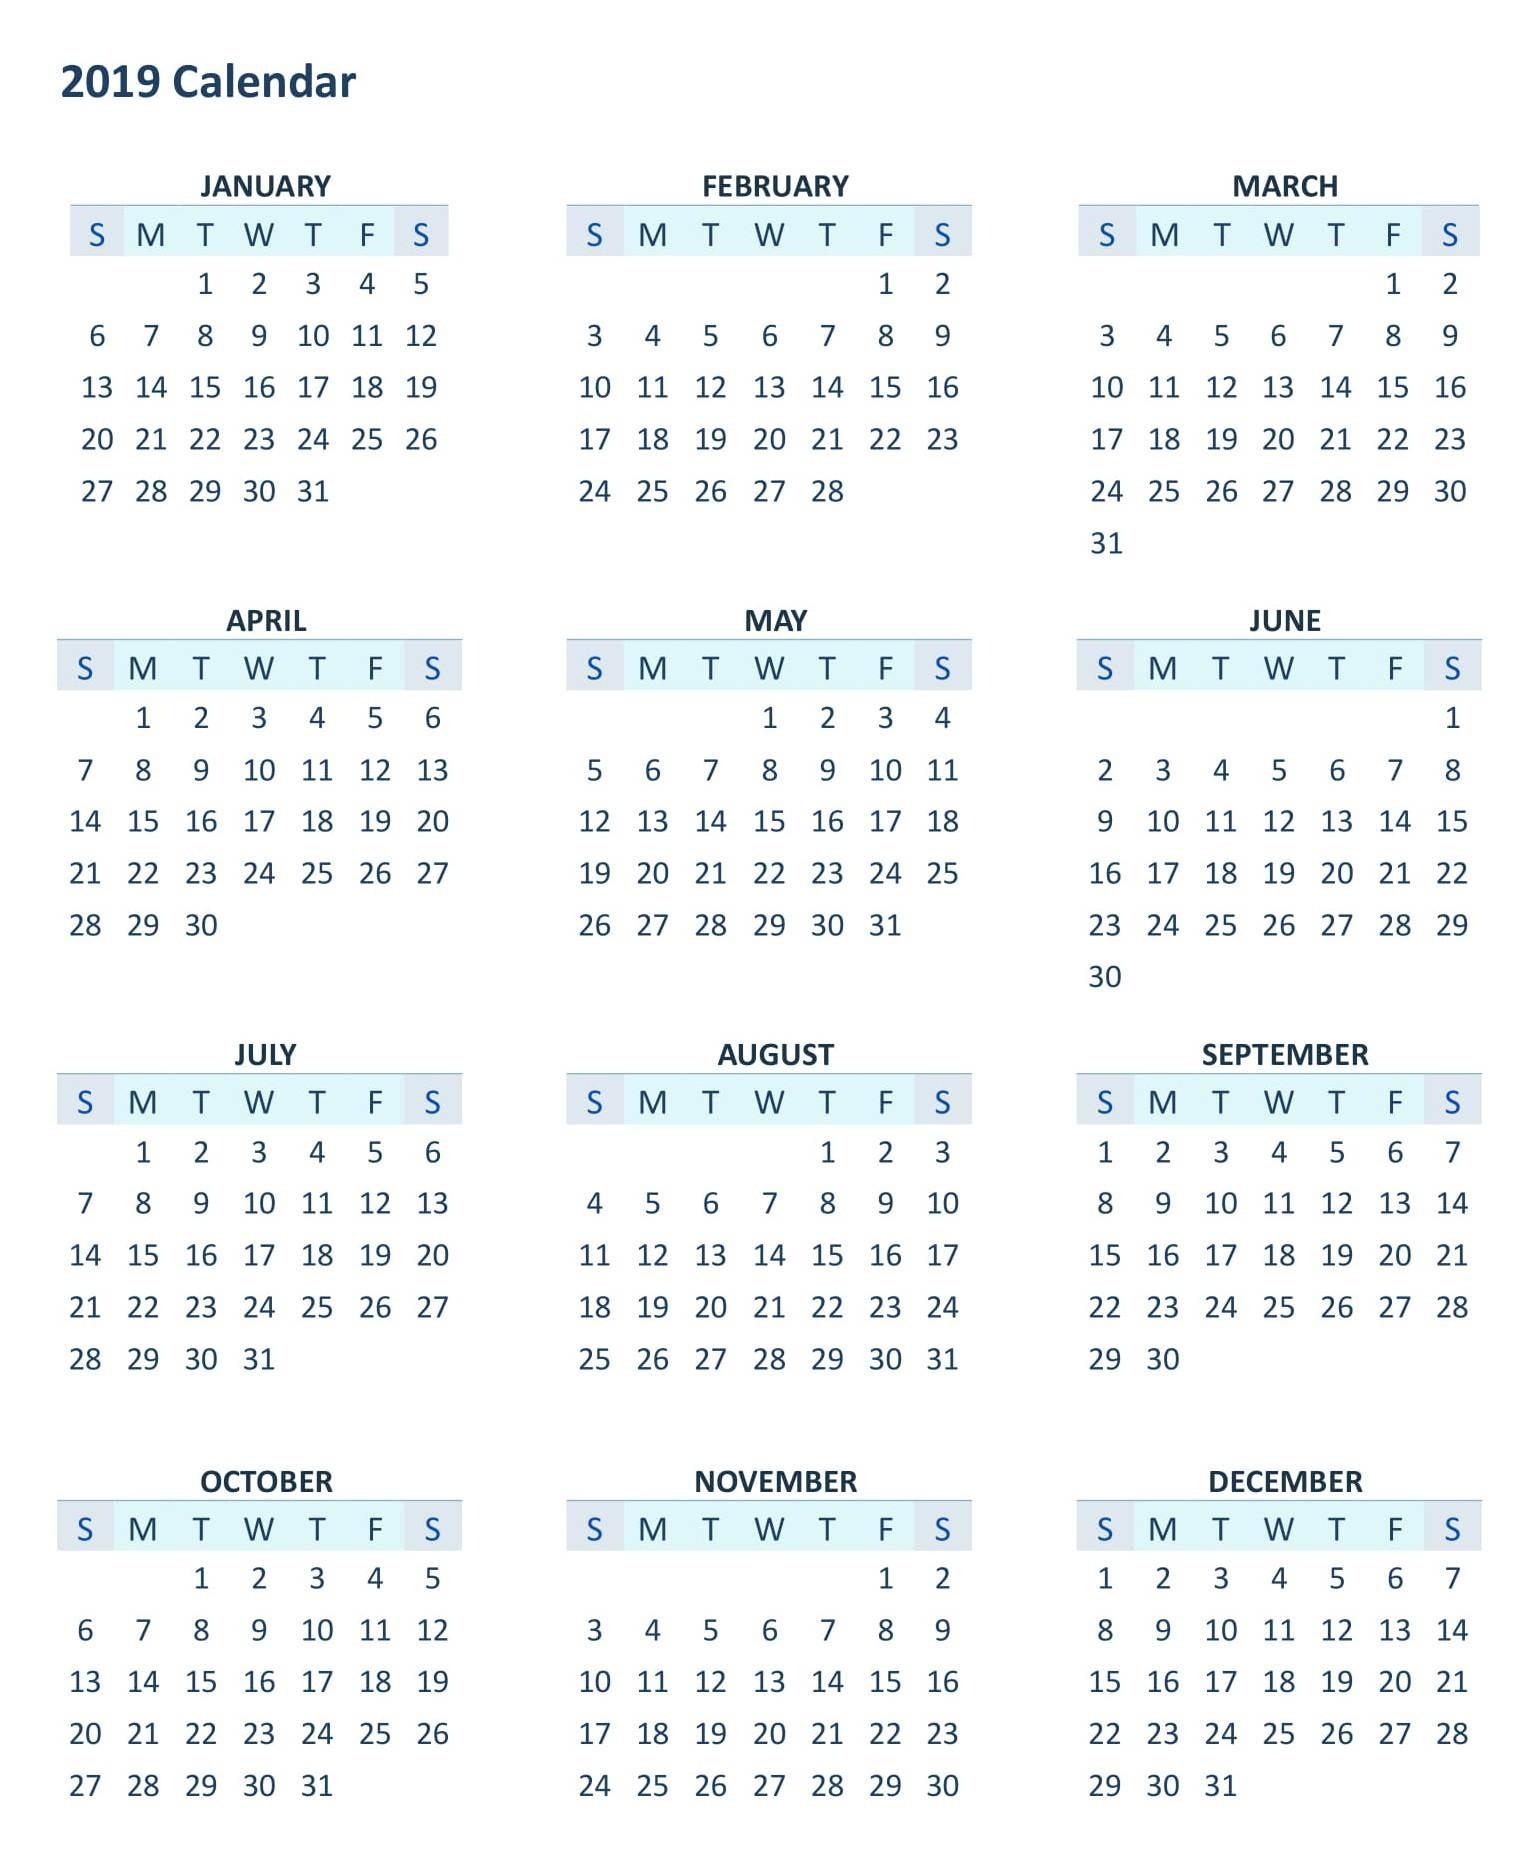 2019 12 Month Printable Calendar Yearly 12 Month Calendar 2019 in Blank Printable Calendar 12 Month